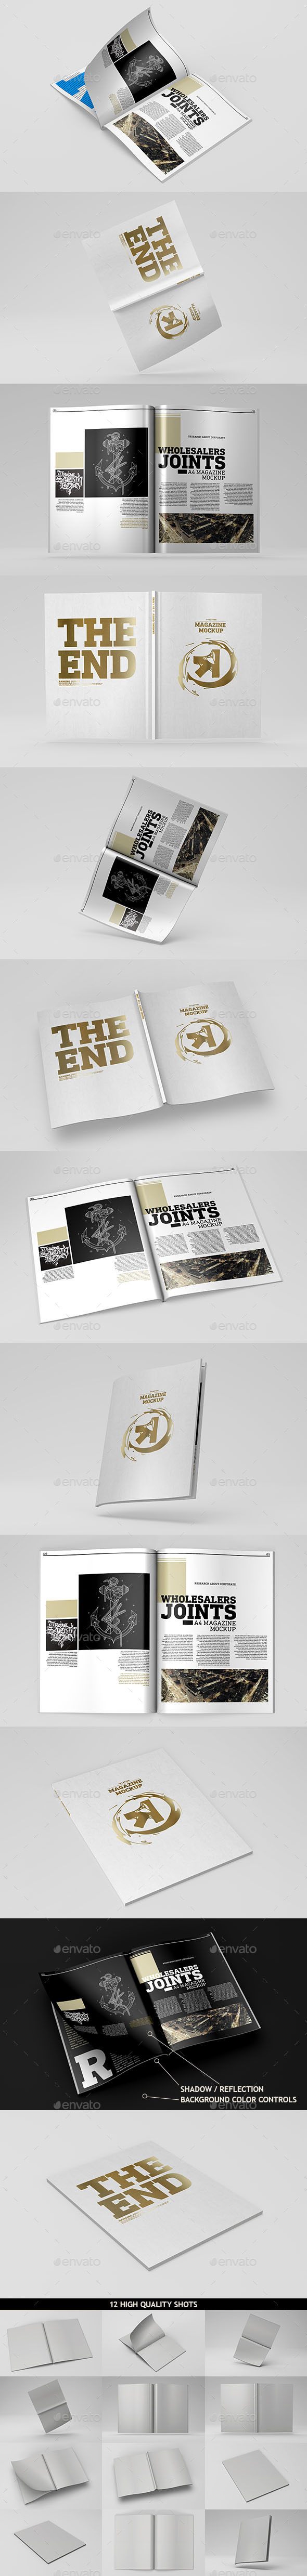 A4 Magazine  Catalog Mockup - Magazines Print